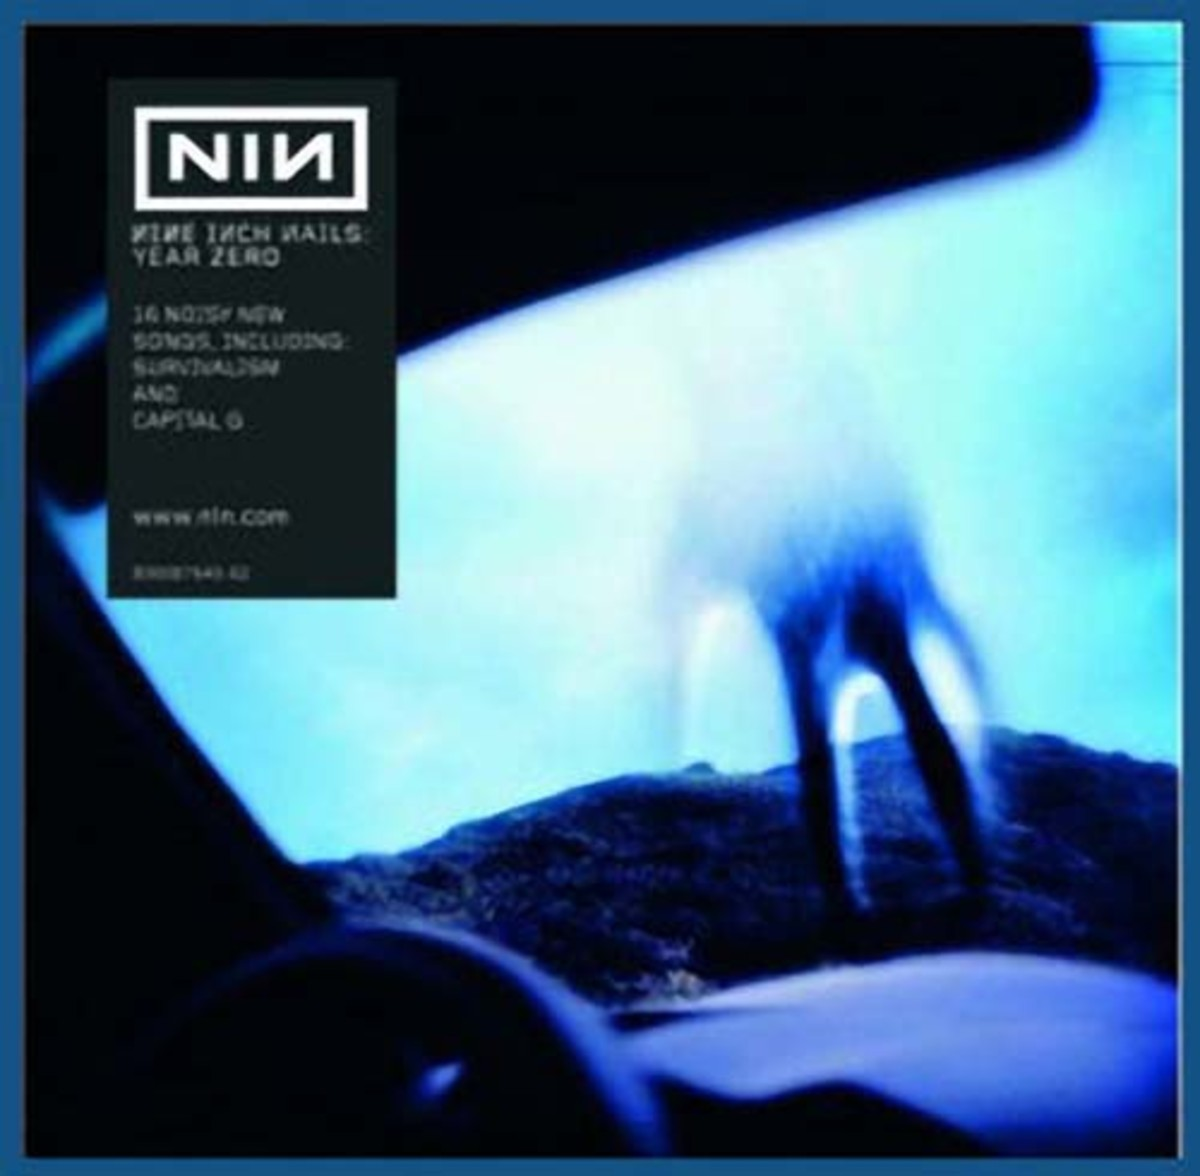 NIN Year Zero